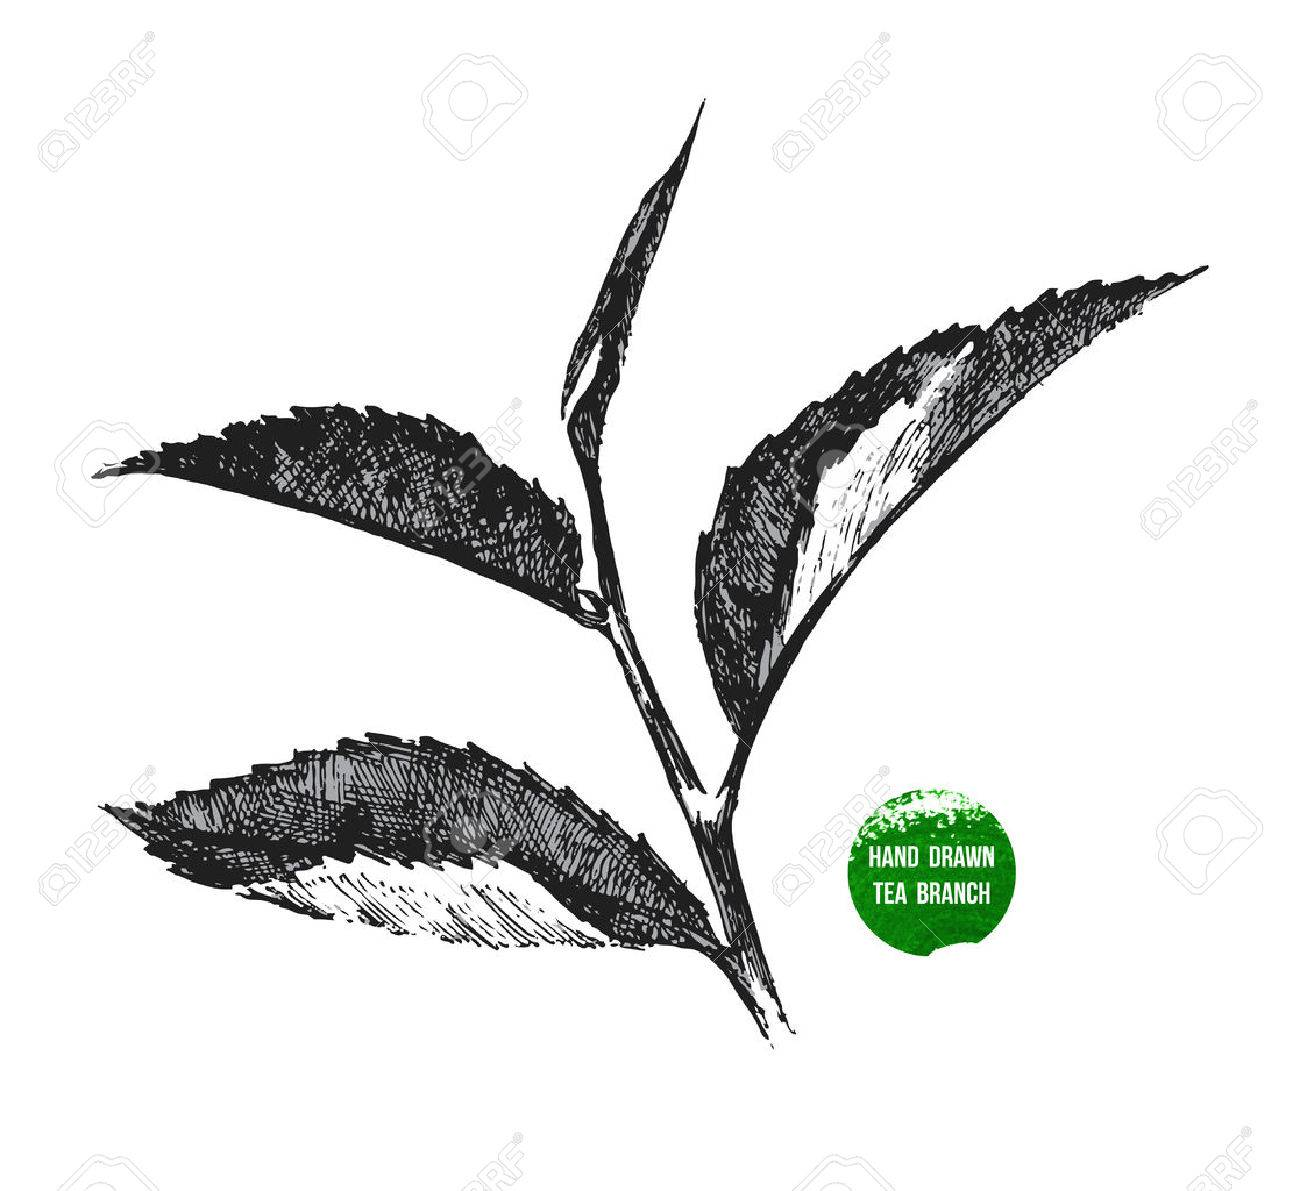 hand drawn tea leaf on white background - 43870997